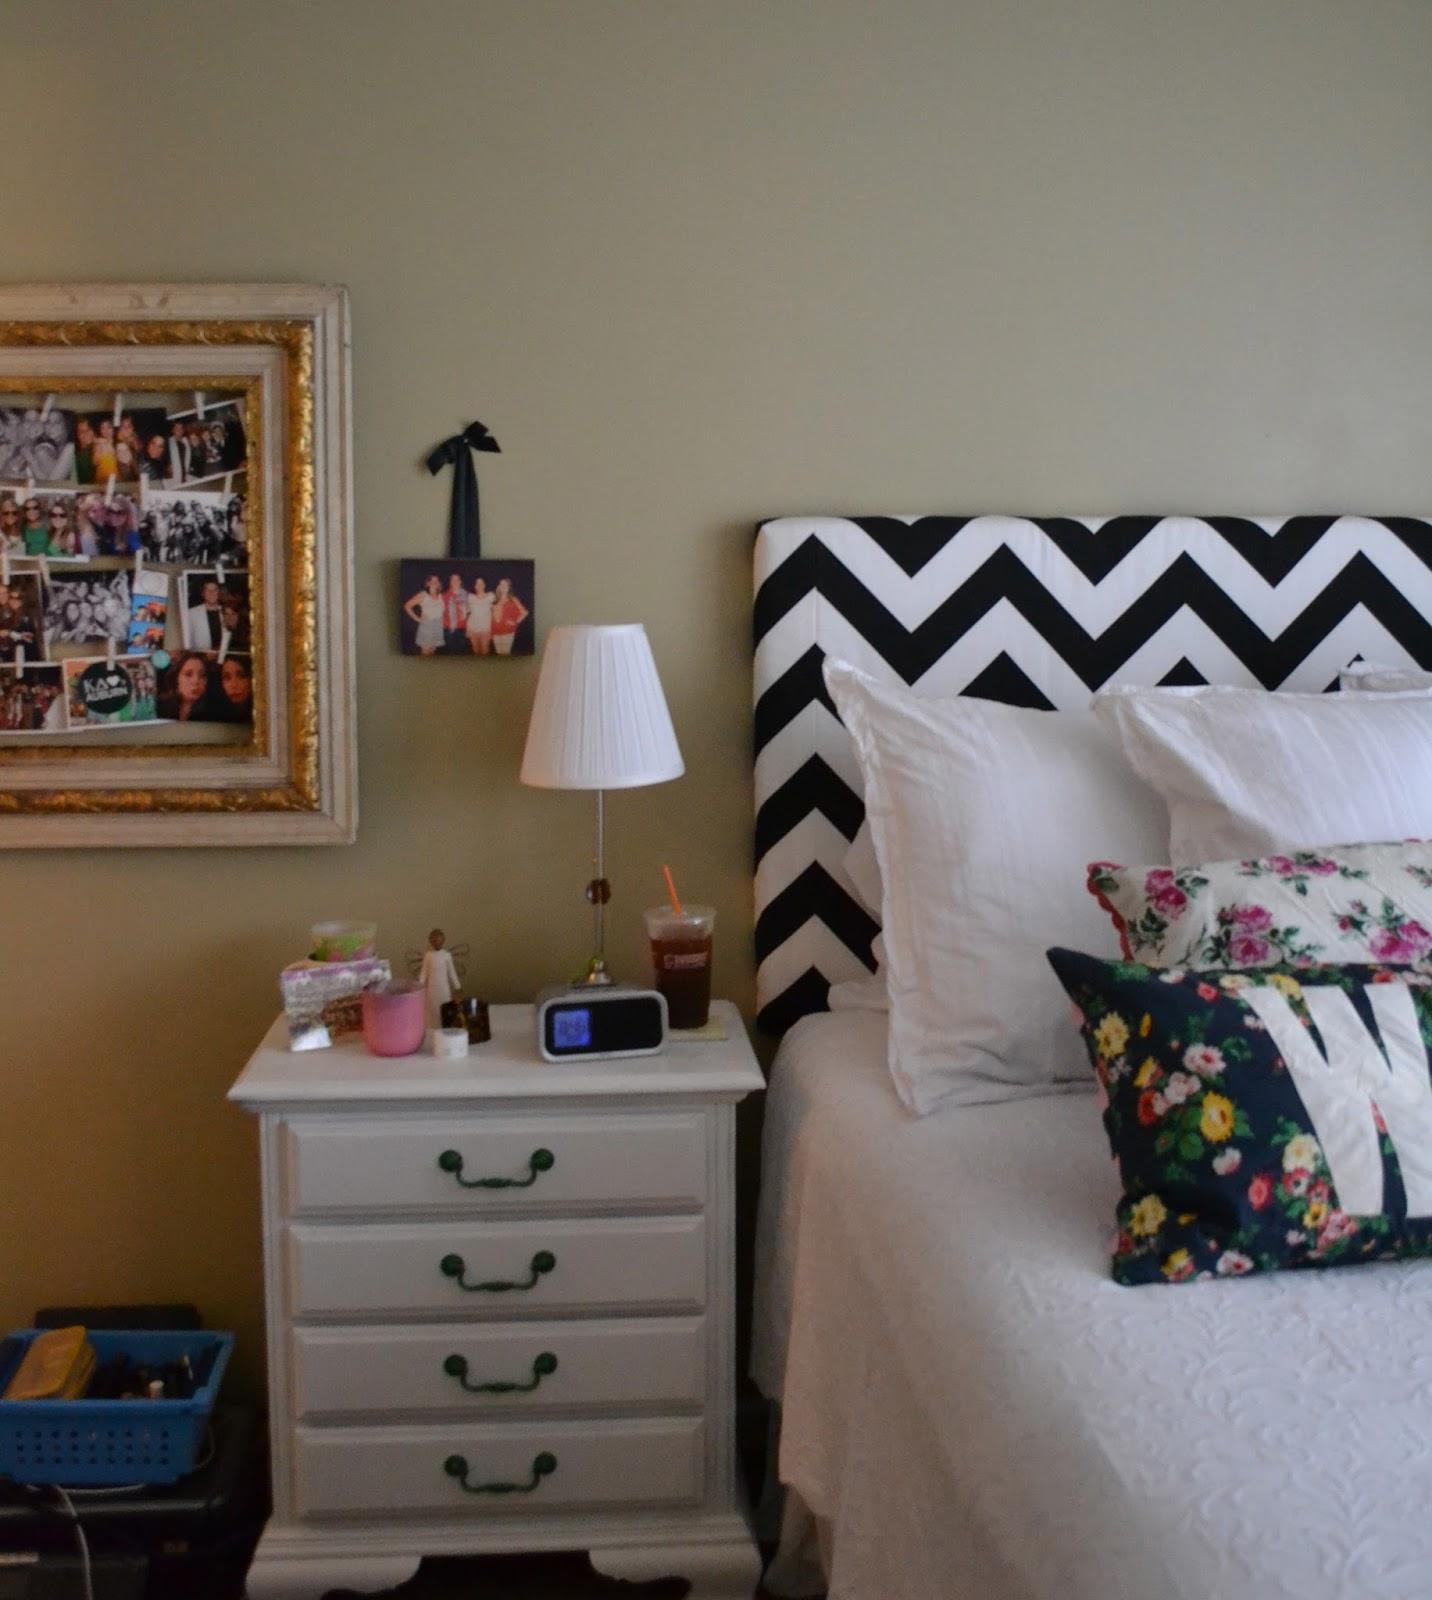 Kim Macumber Interiors: DIY for Dorm Livin'